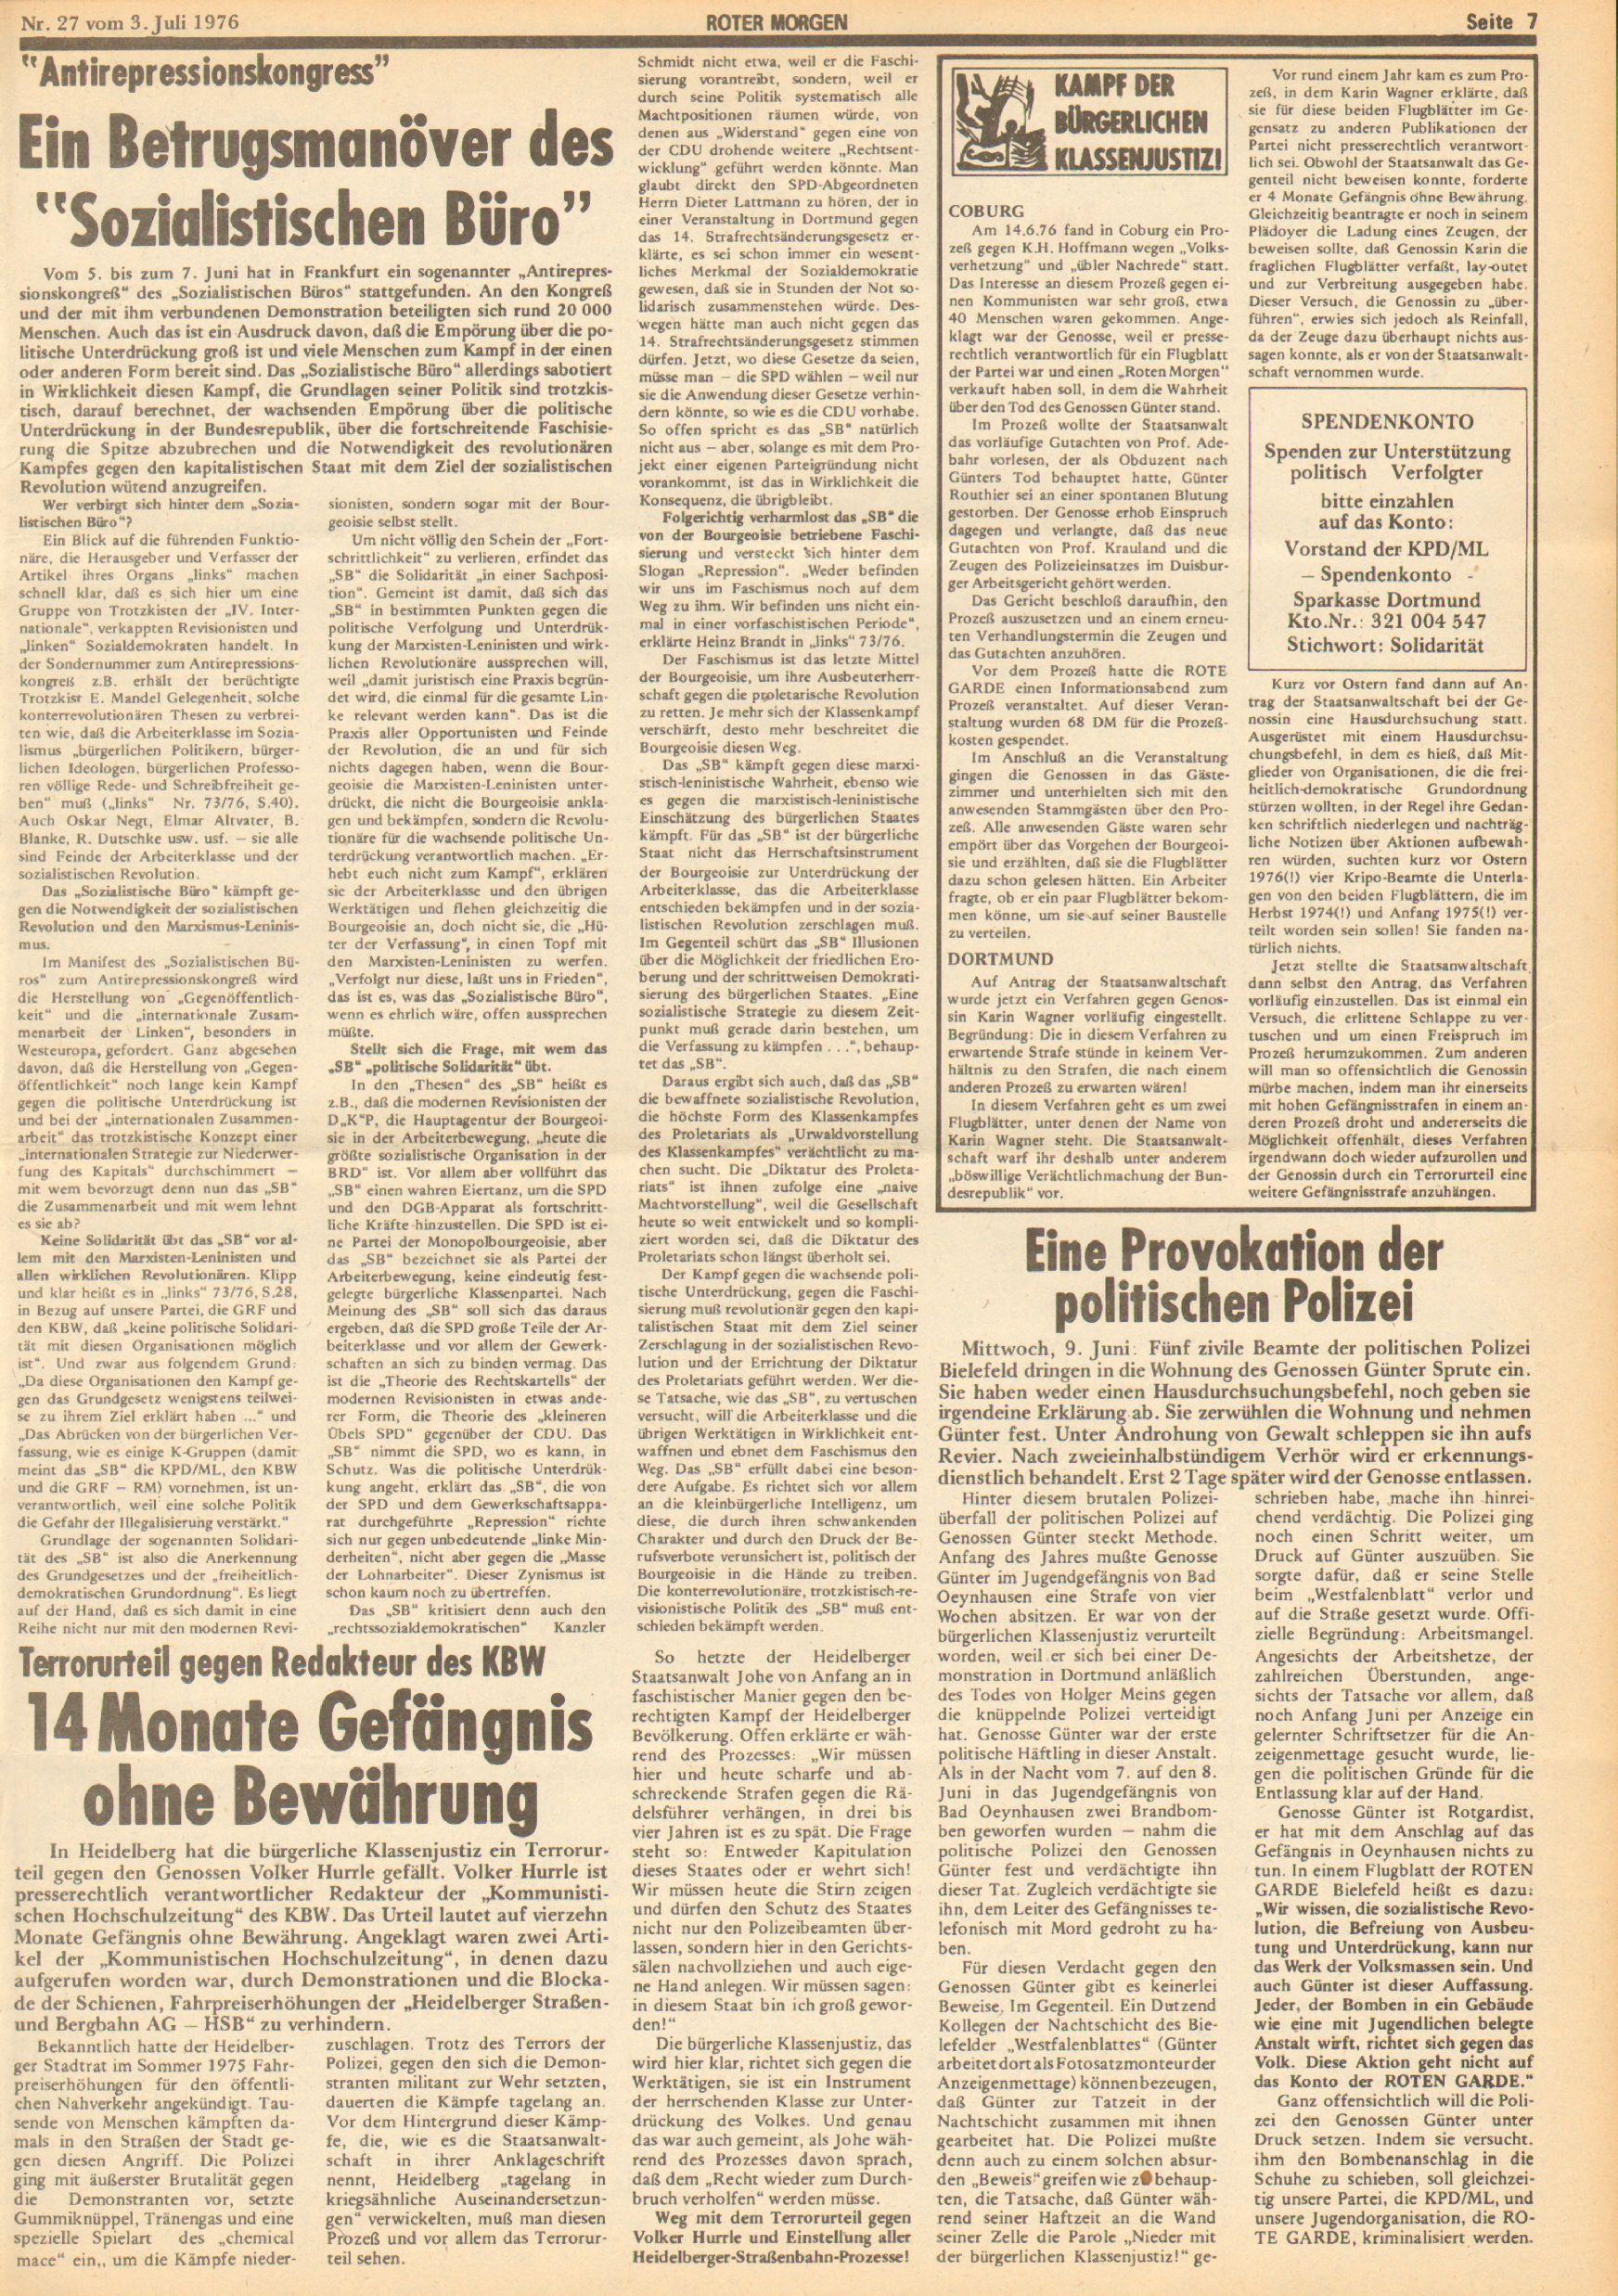 Roter Morgen, 10. Jg., 3. Juli 1976, Nr. 27, Seite 7